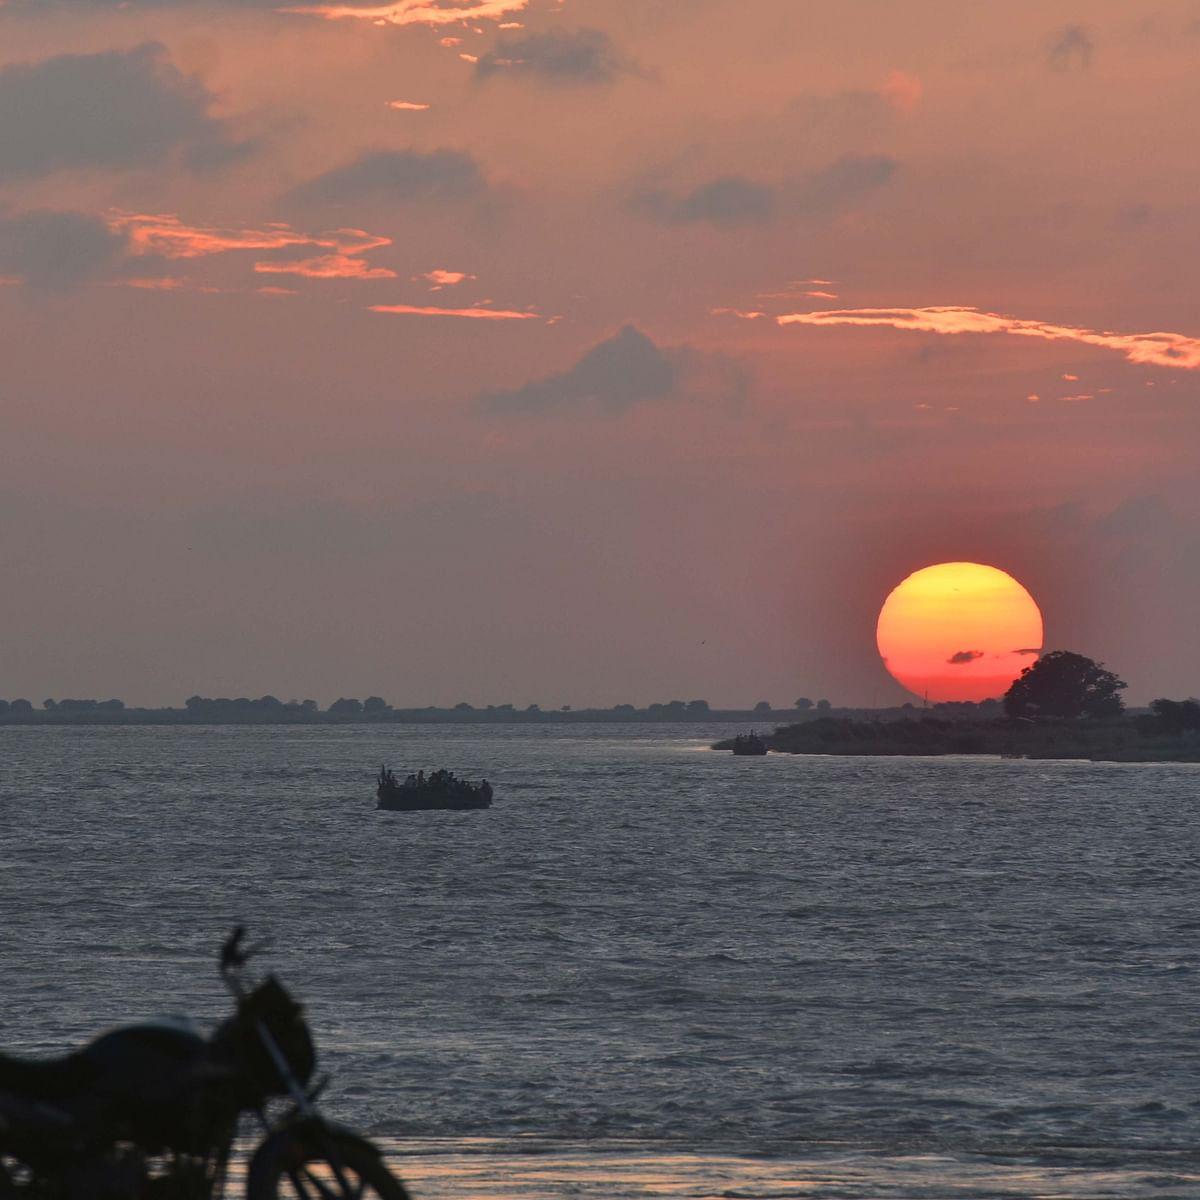 (Photo by Parwaz Khan/Hindustan Times via Getty Images)